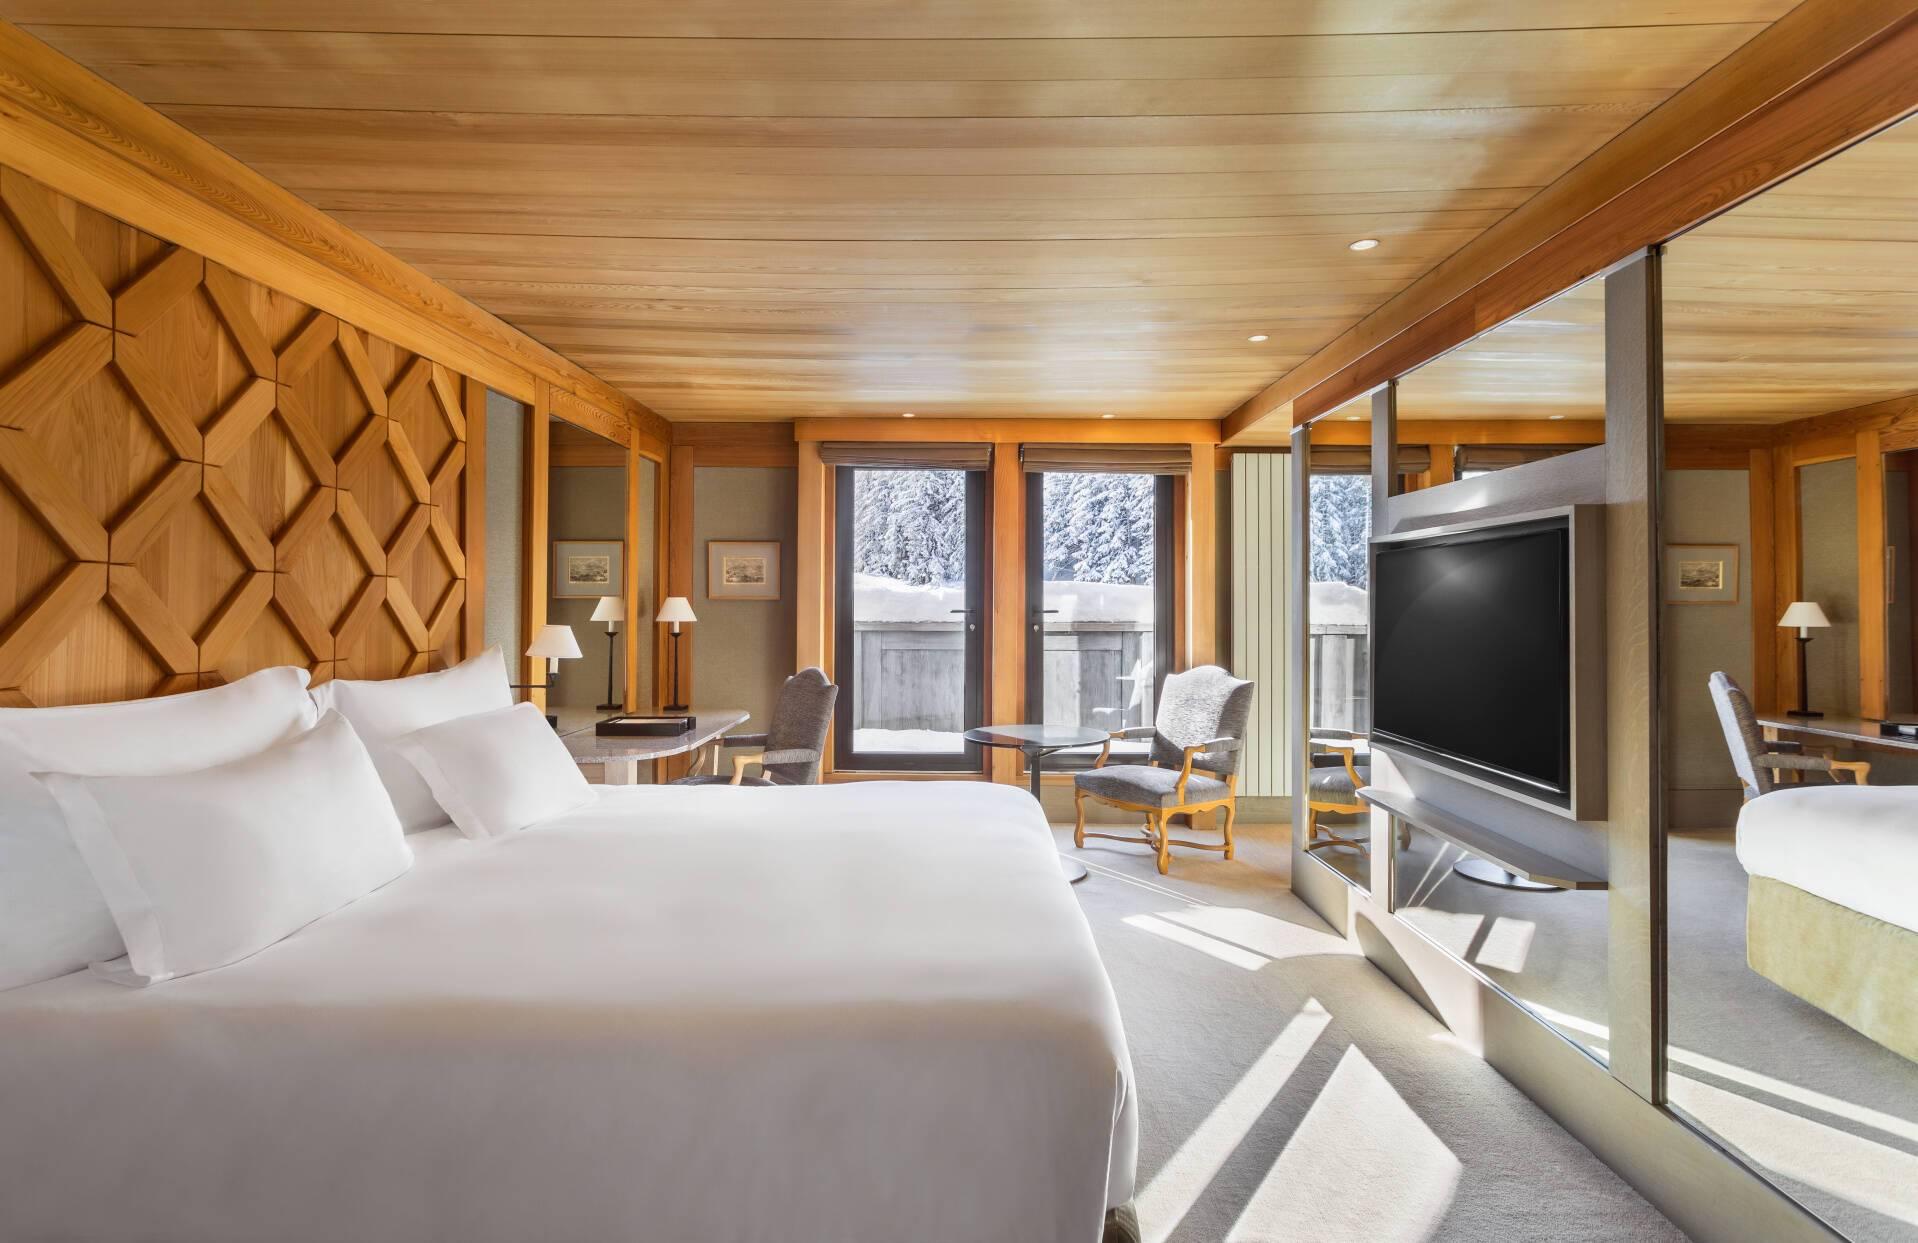 Aman Le Melezin Courchevel Chambre Ski Piste